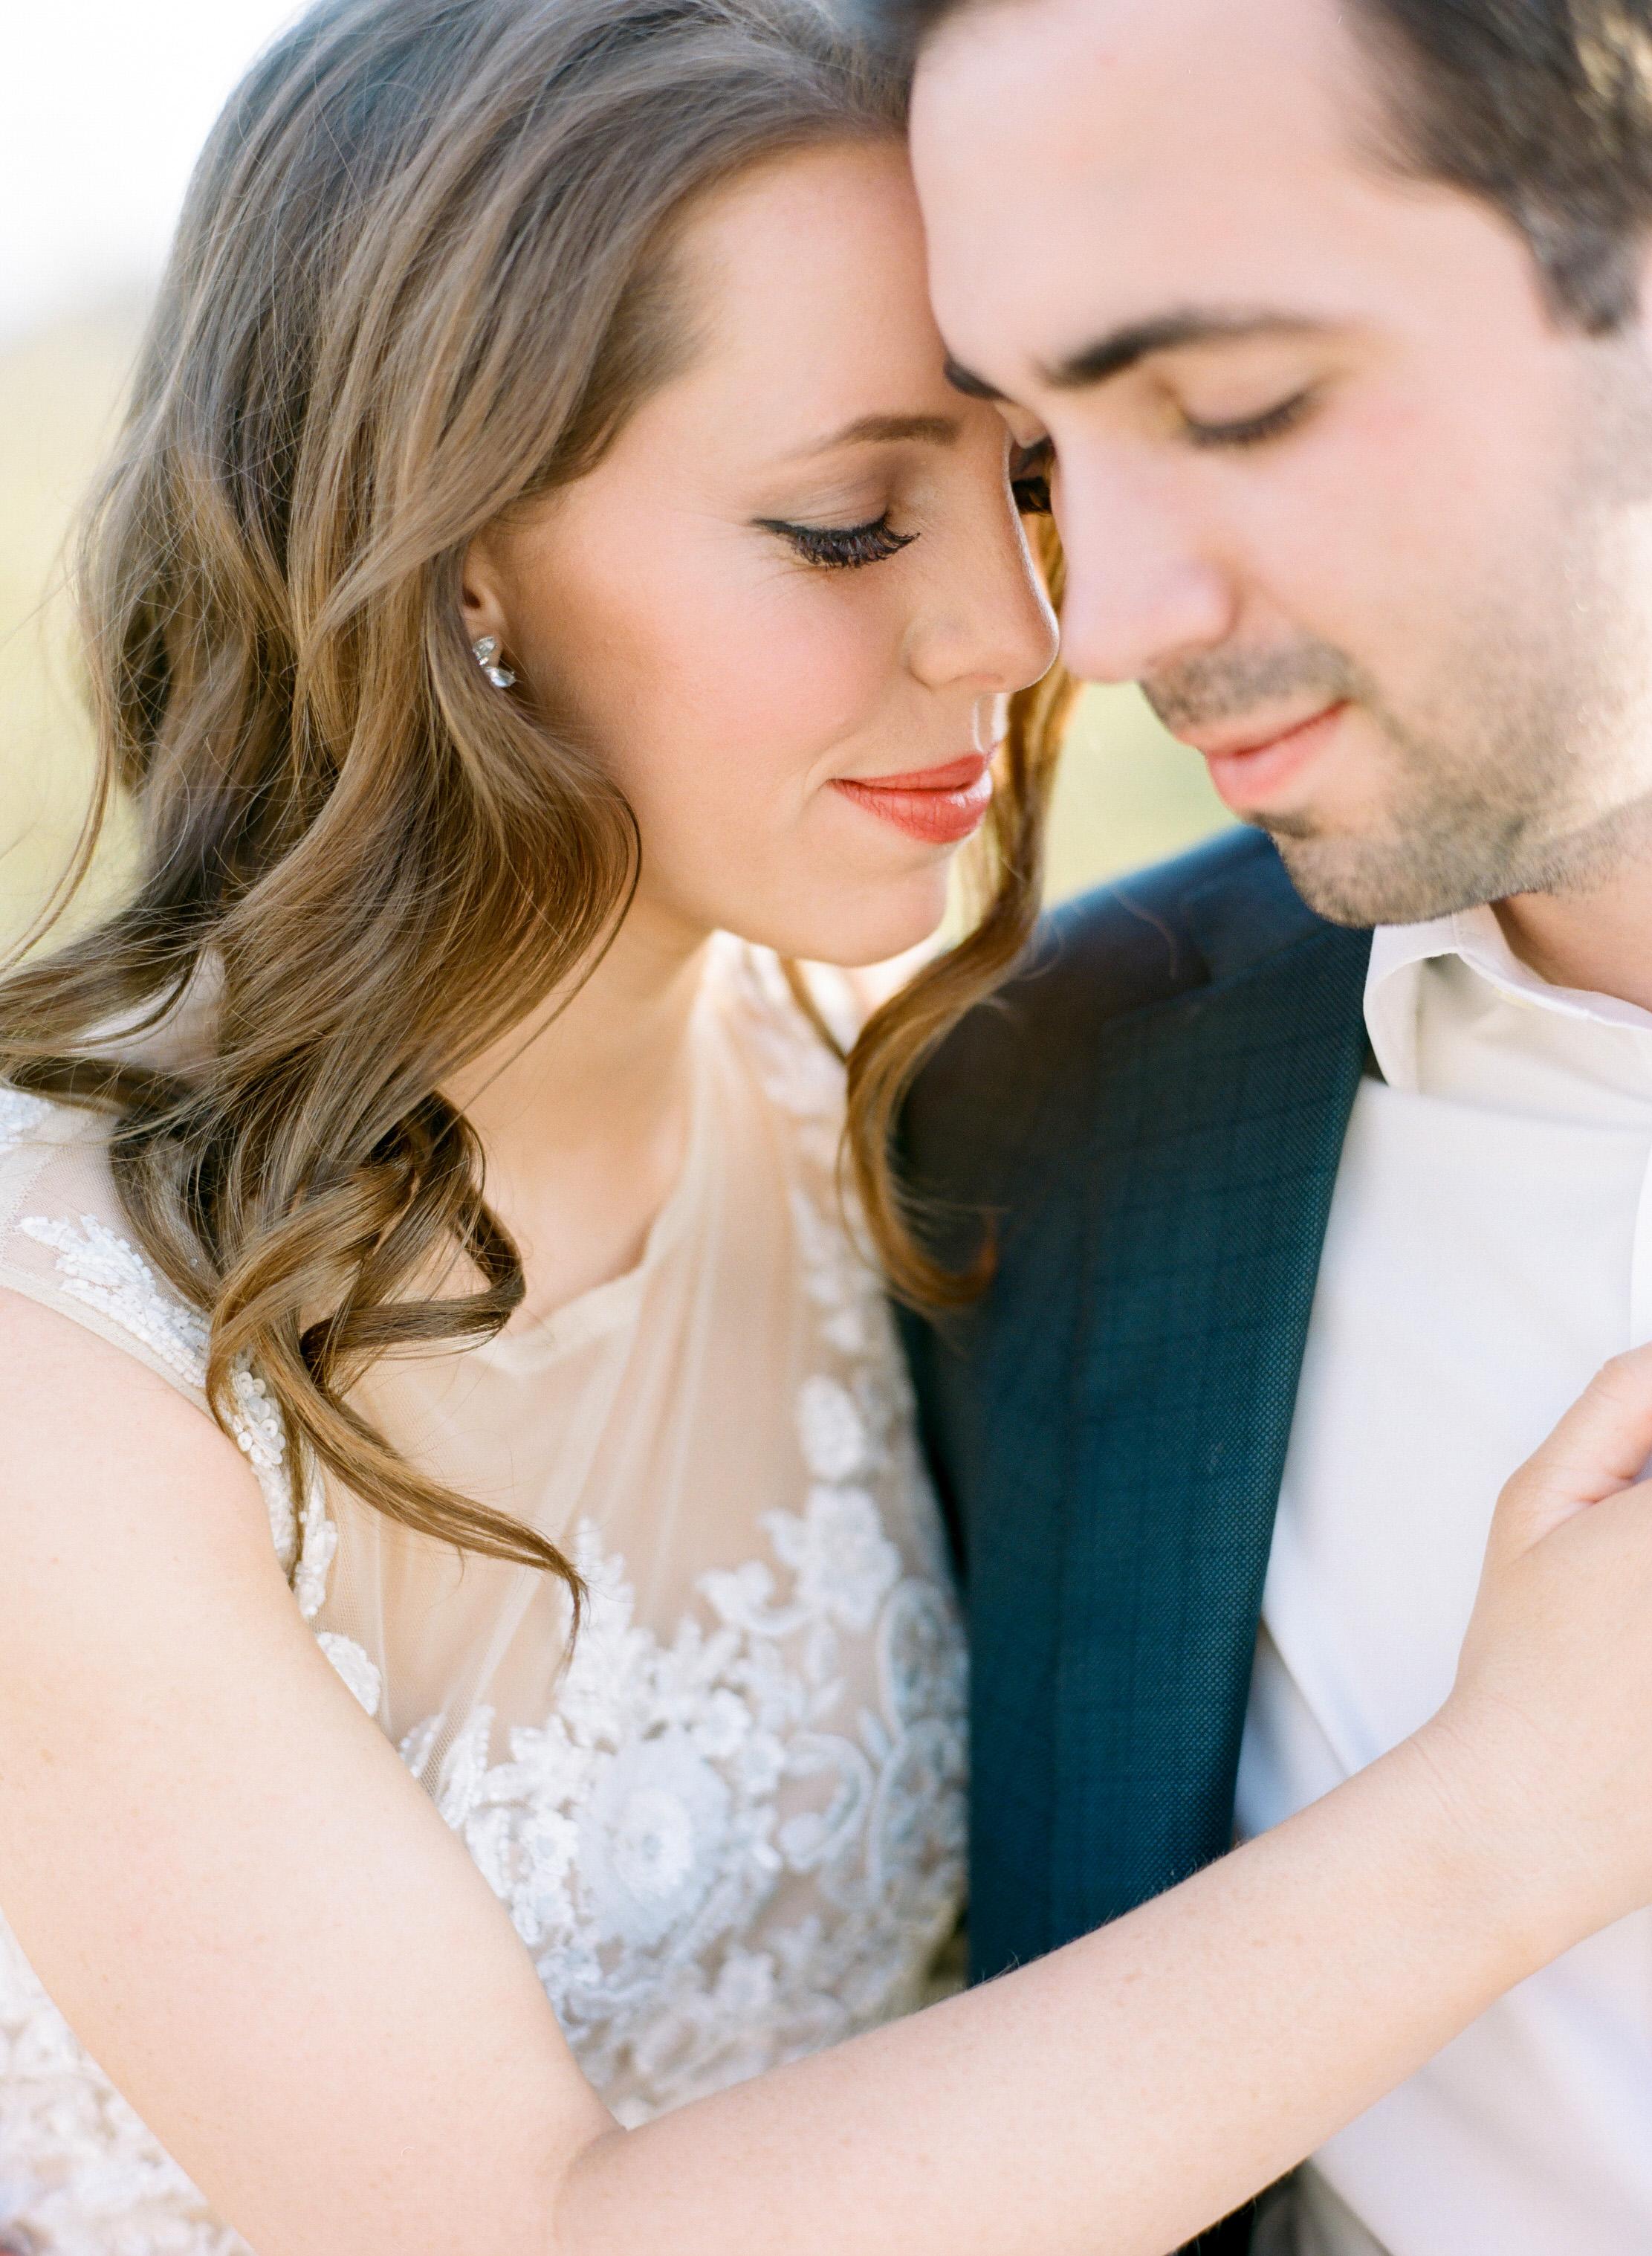 Dana-Fernandez-Photography-Destination-Wedding-Photographer-Cabo-San-Lucas-Film-Houston-Texas-Cabo-9.jpg